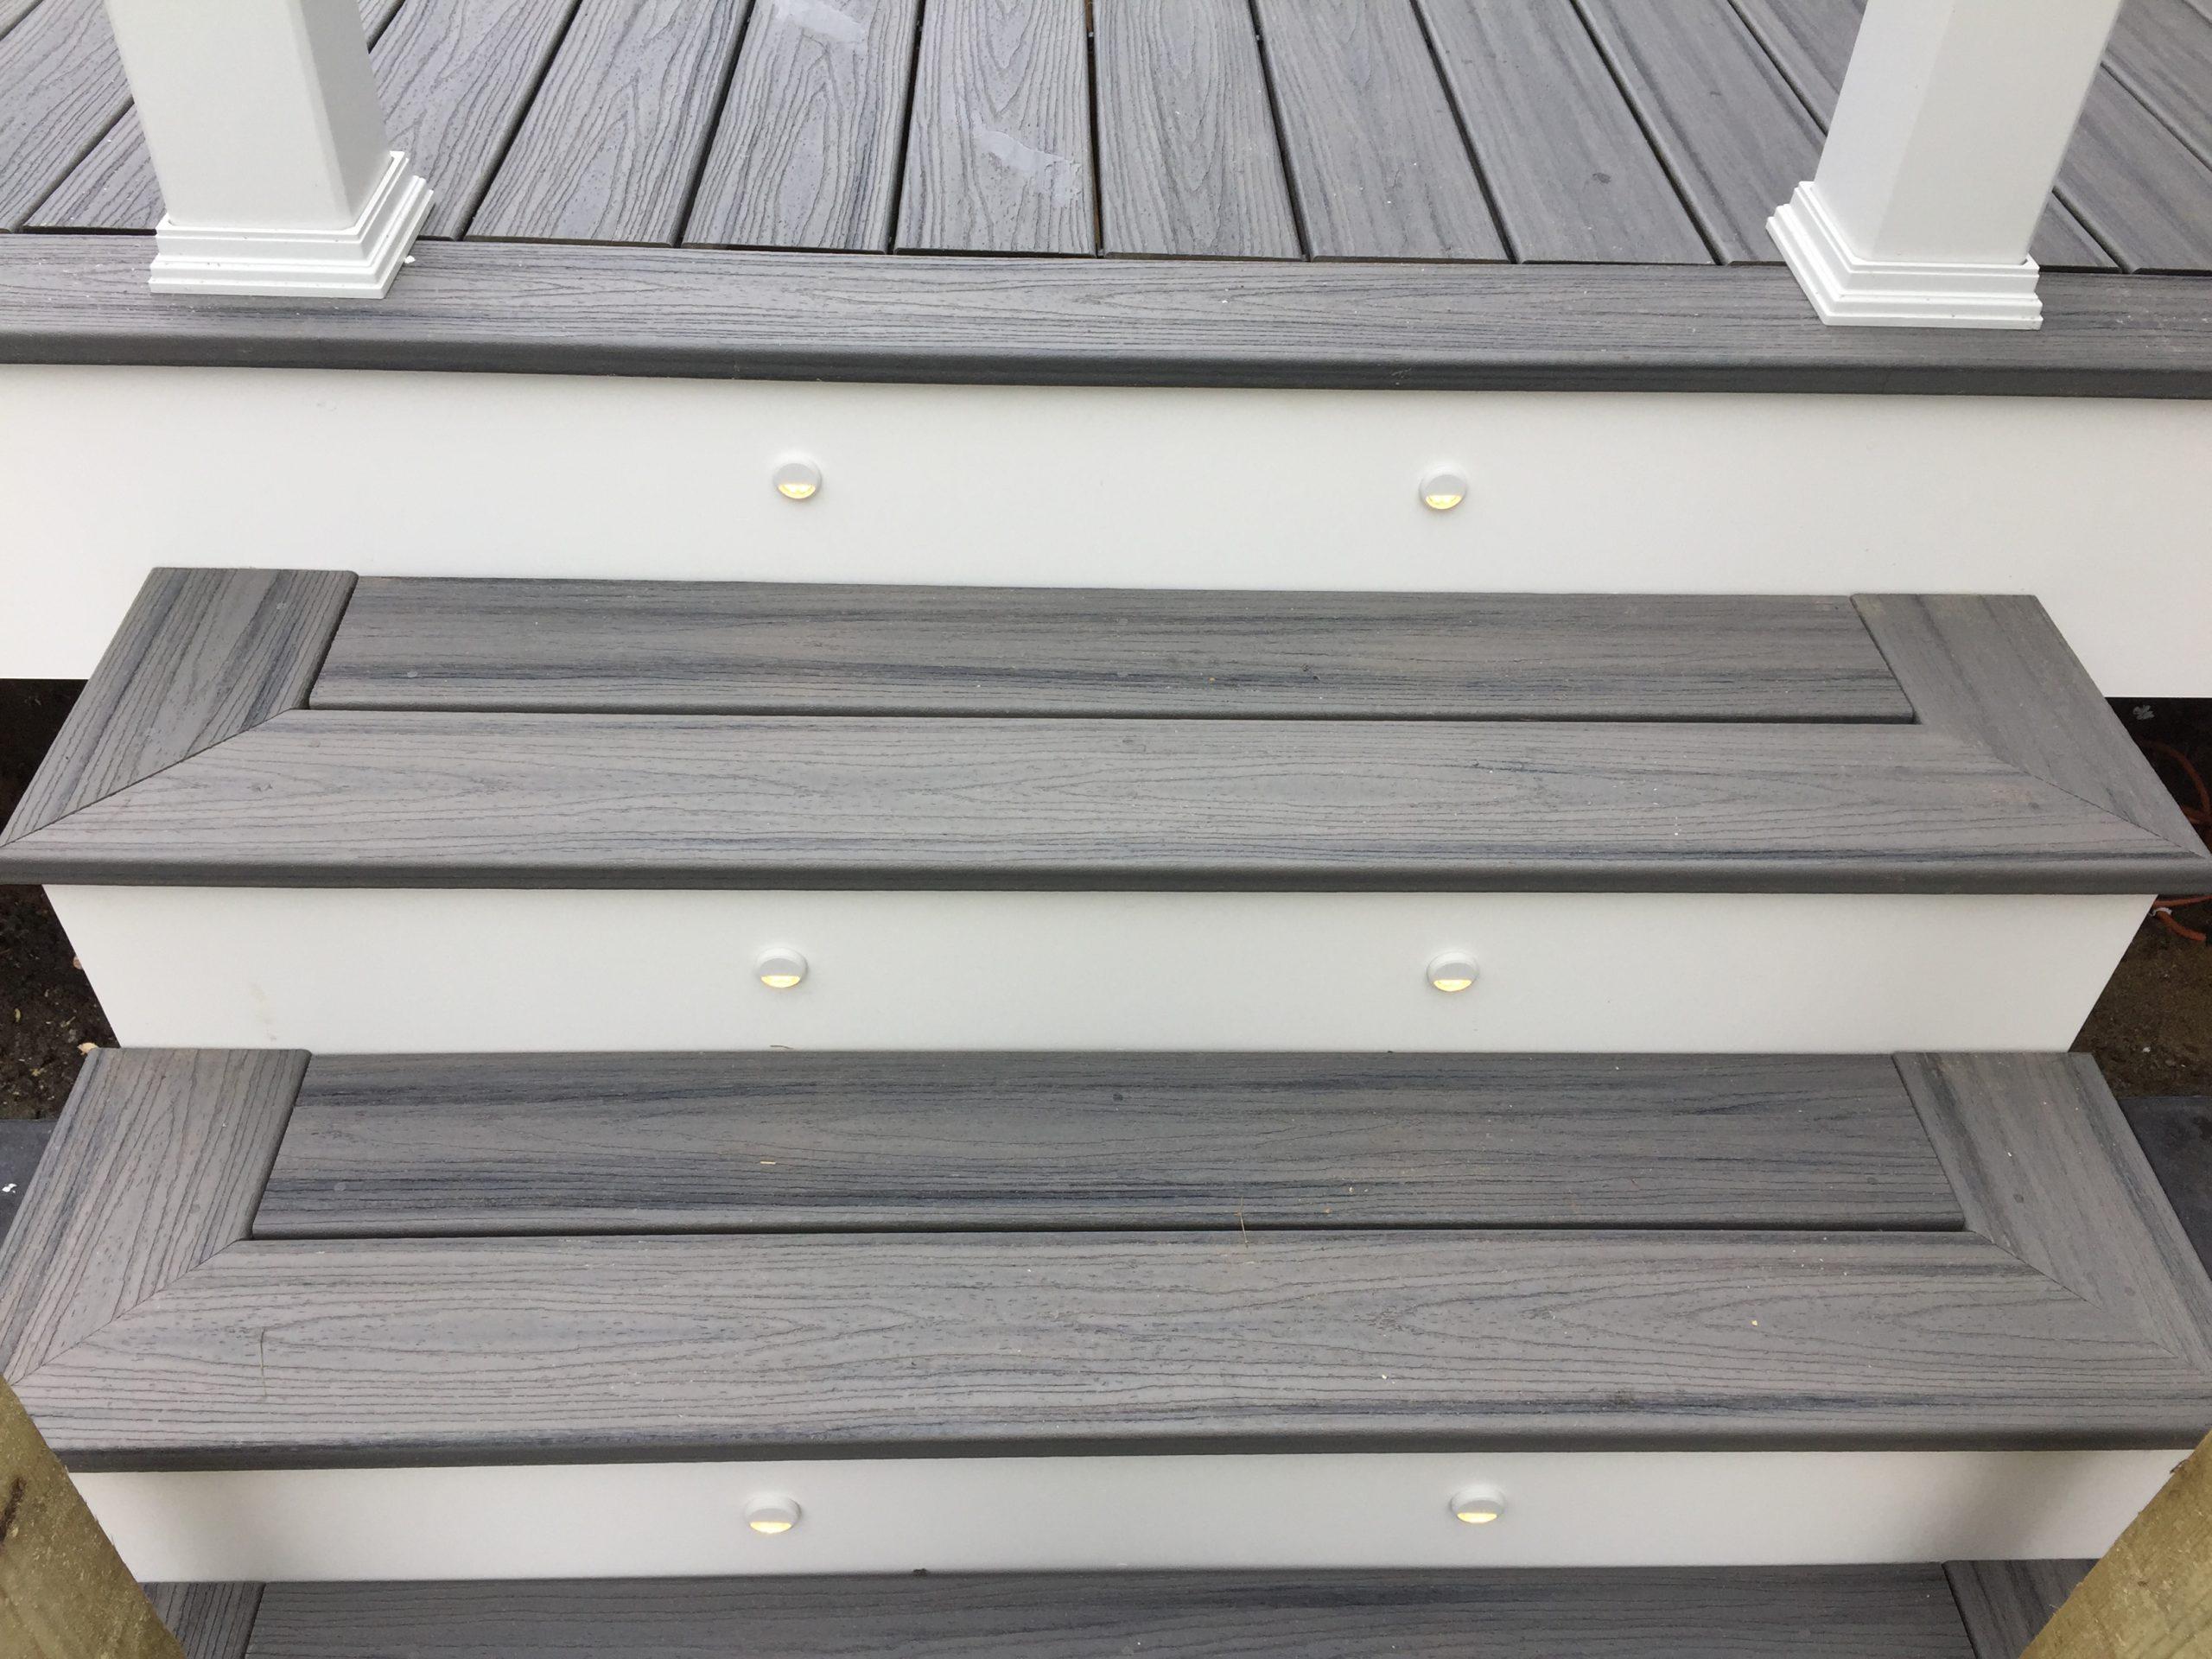 Quality Deck Materials